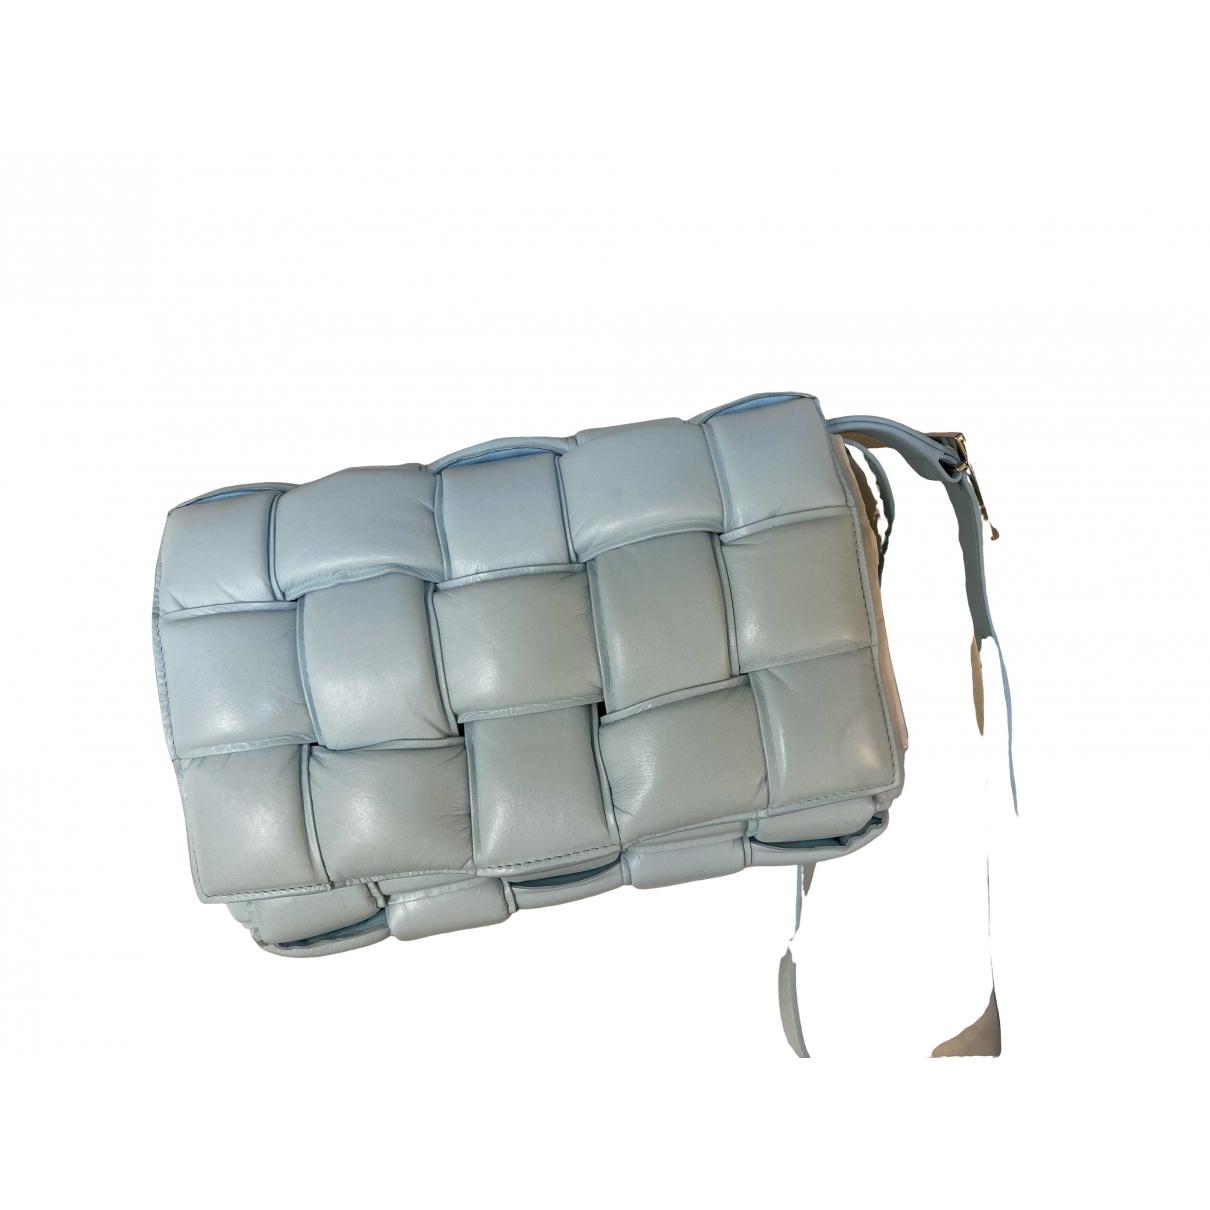 Bottega Veneta - Sac a main Cassette pour femme en cuir - bleu